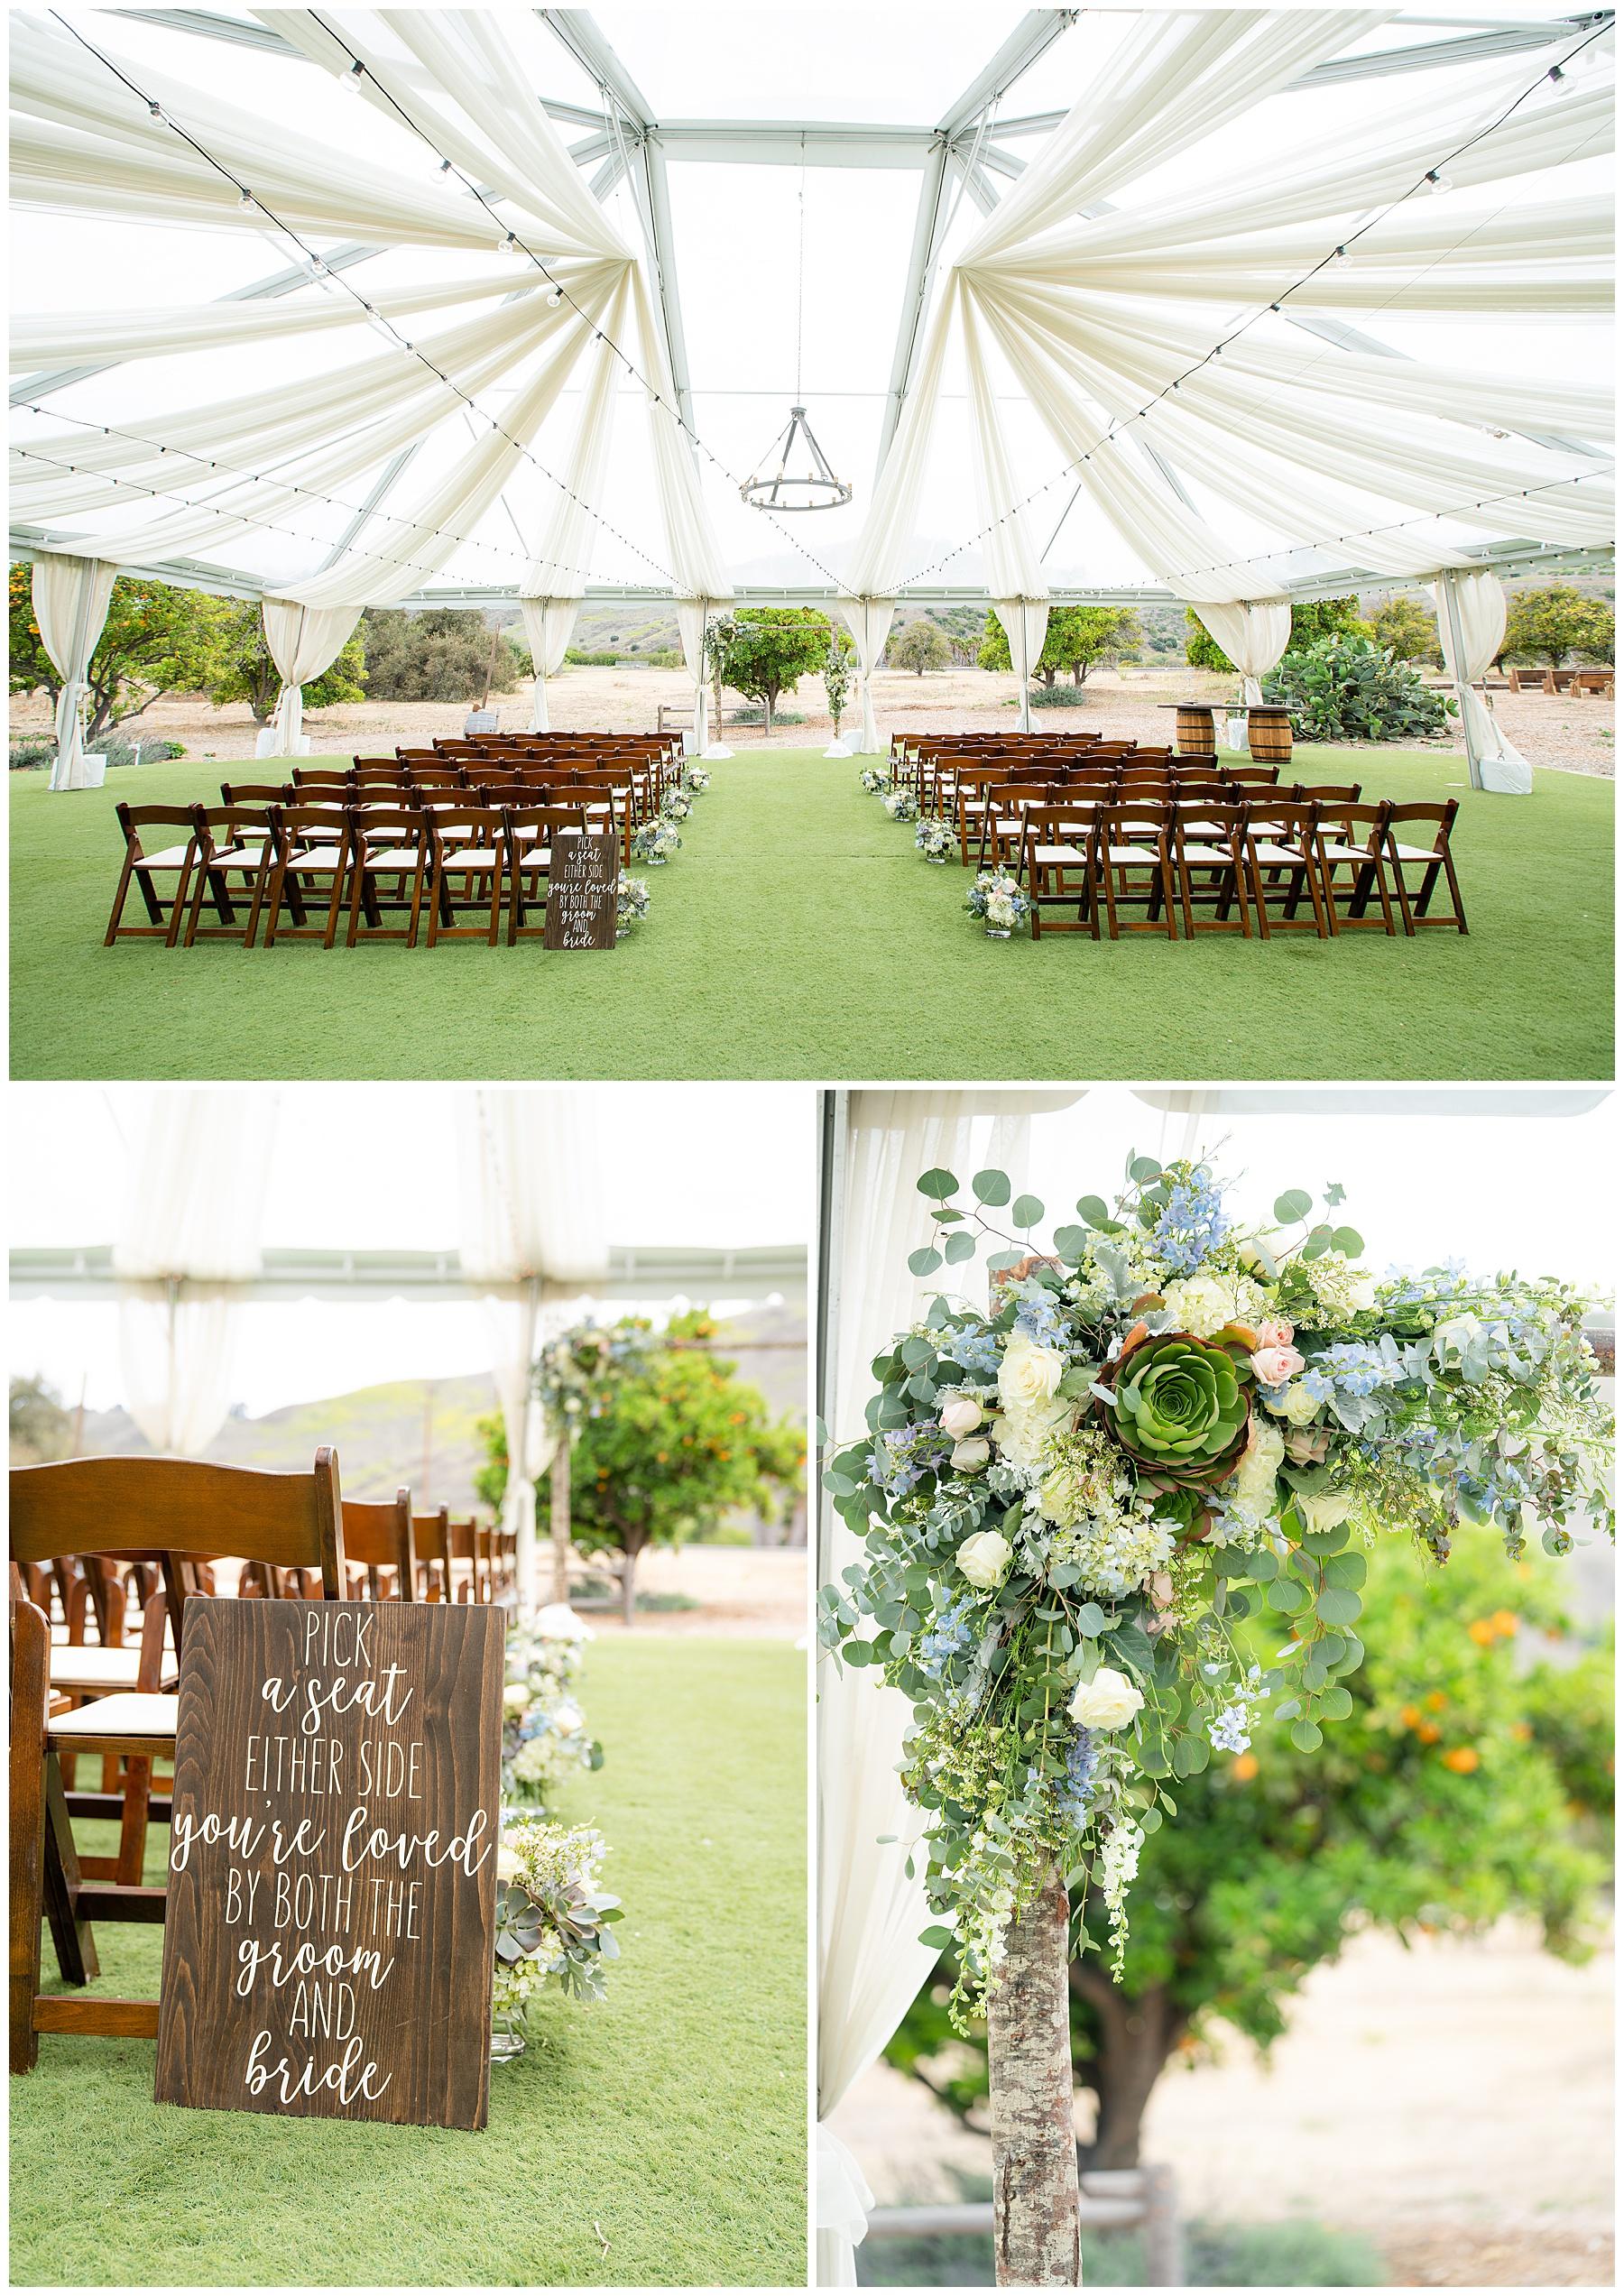 wedding under a clear tent